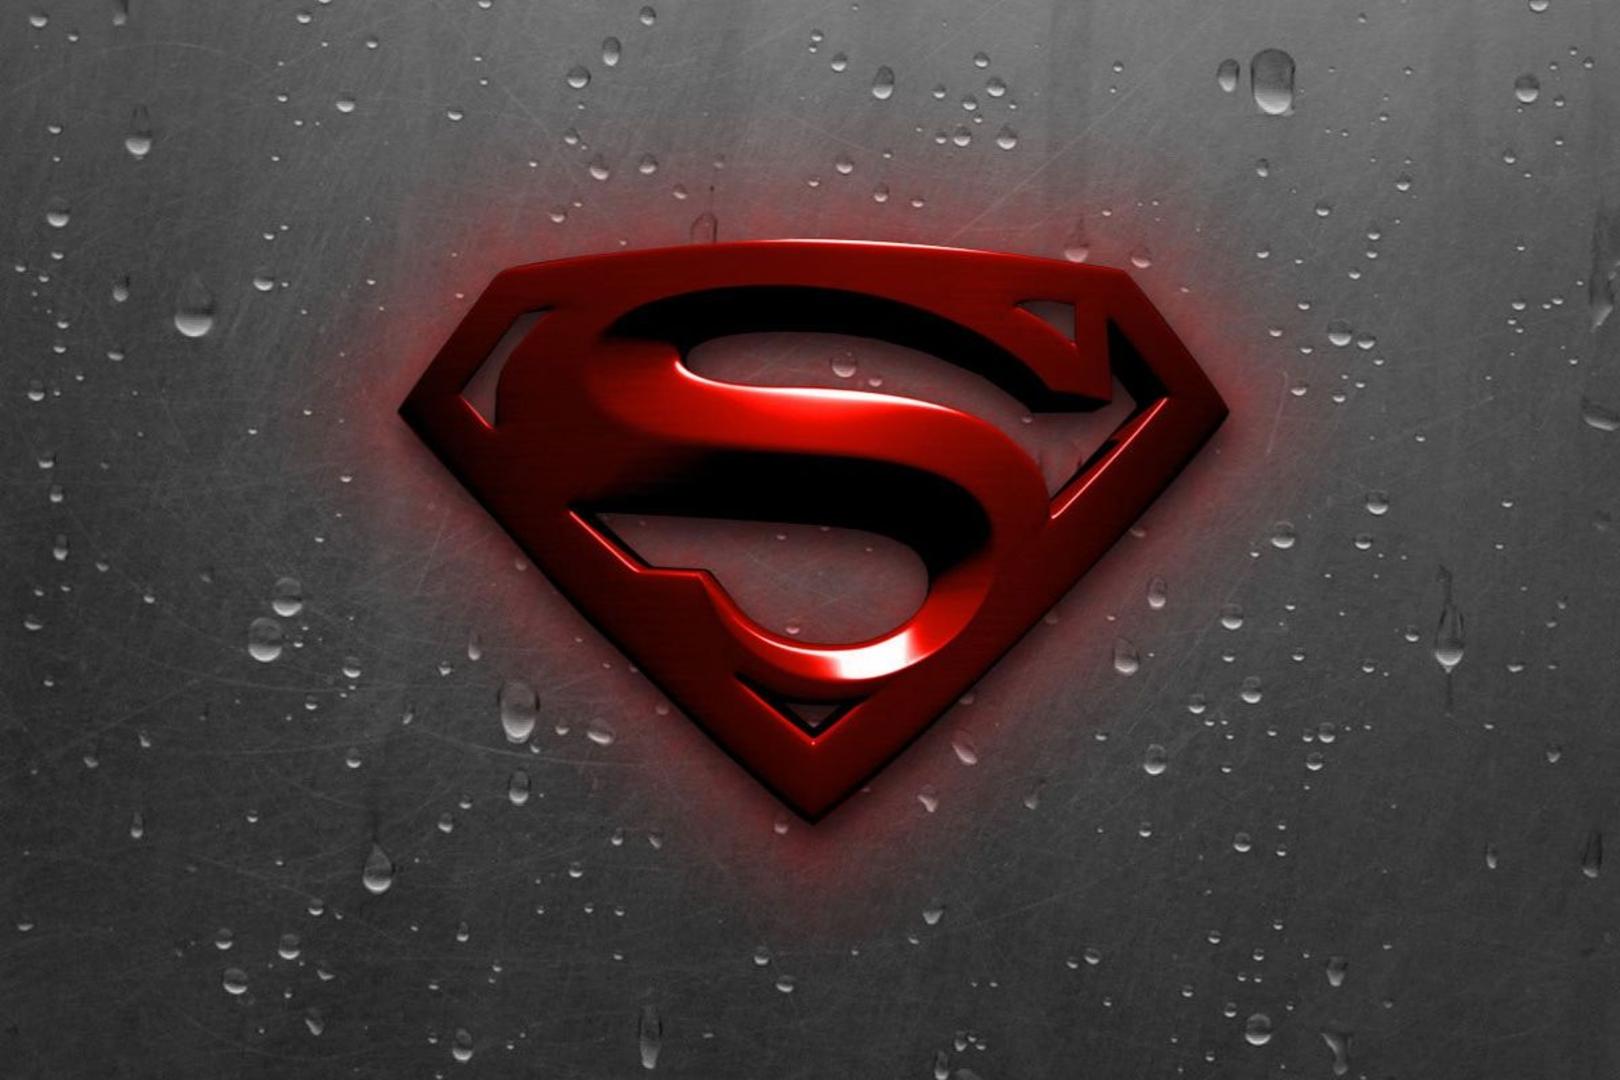 Hd wallpaper superman - Wallpapers For Superman Logo Wallpaper Hd 1920x1080